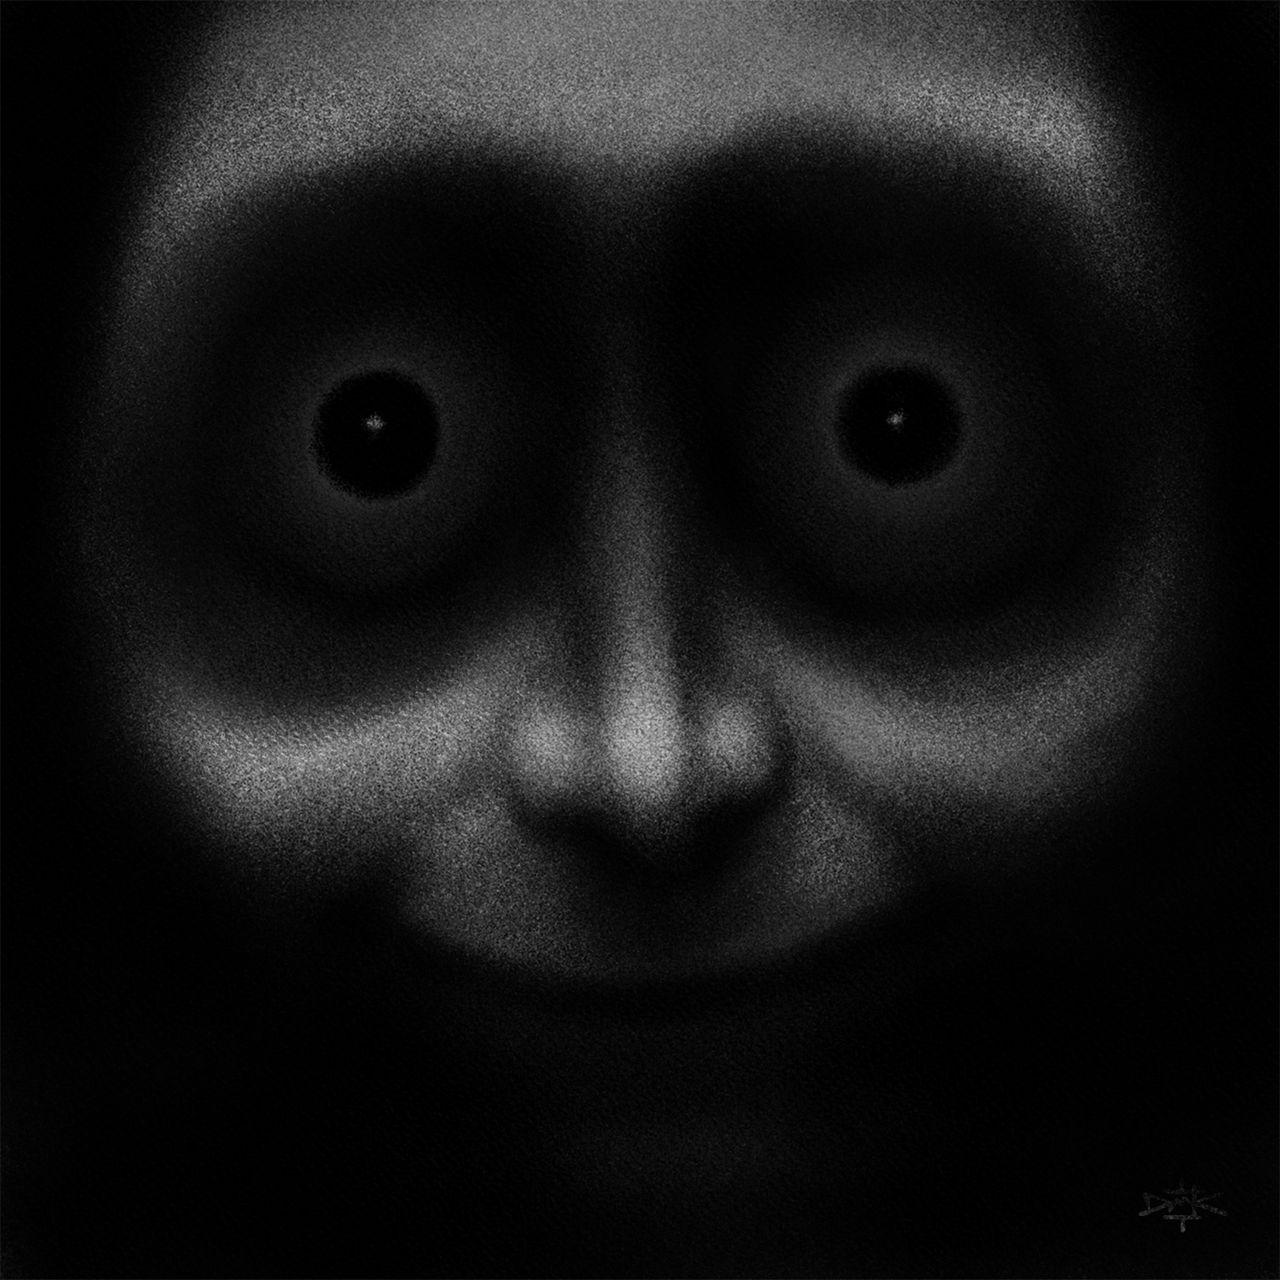 Nightmare awaits